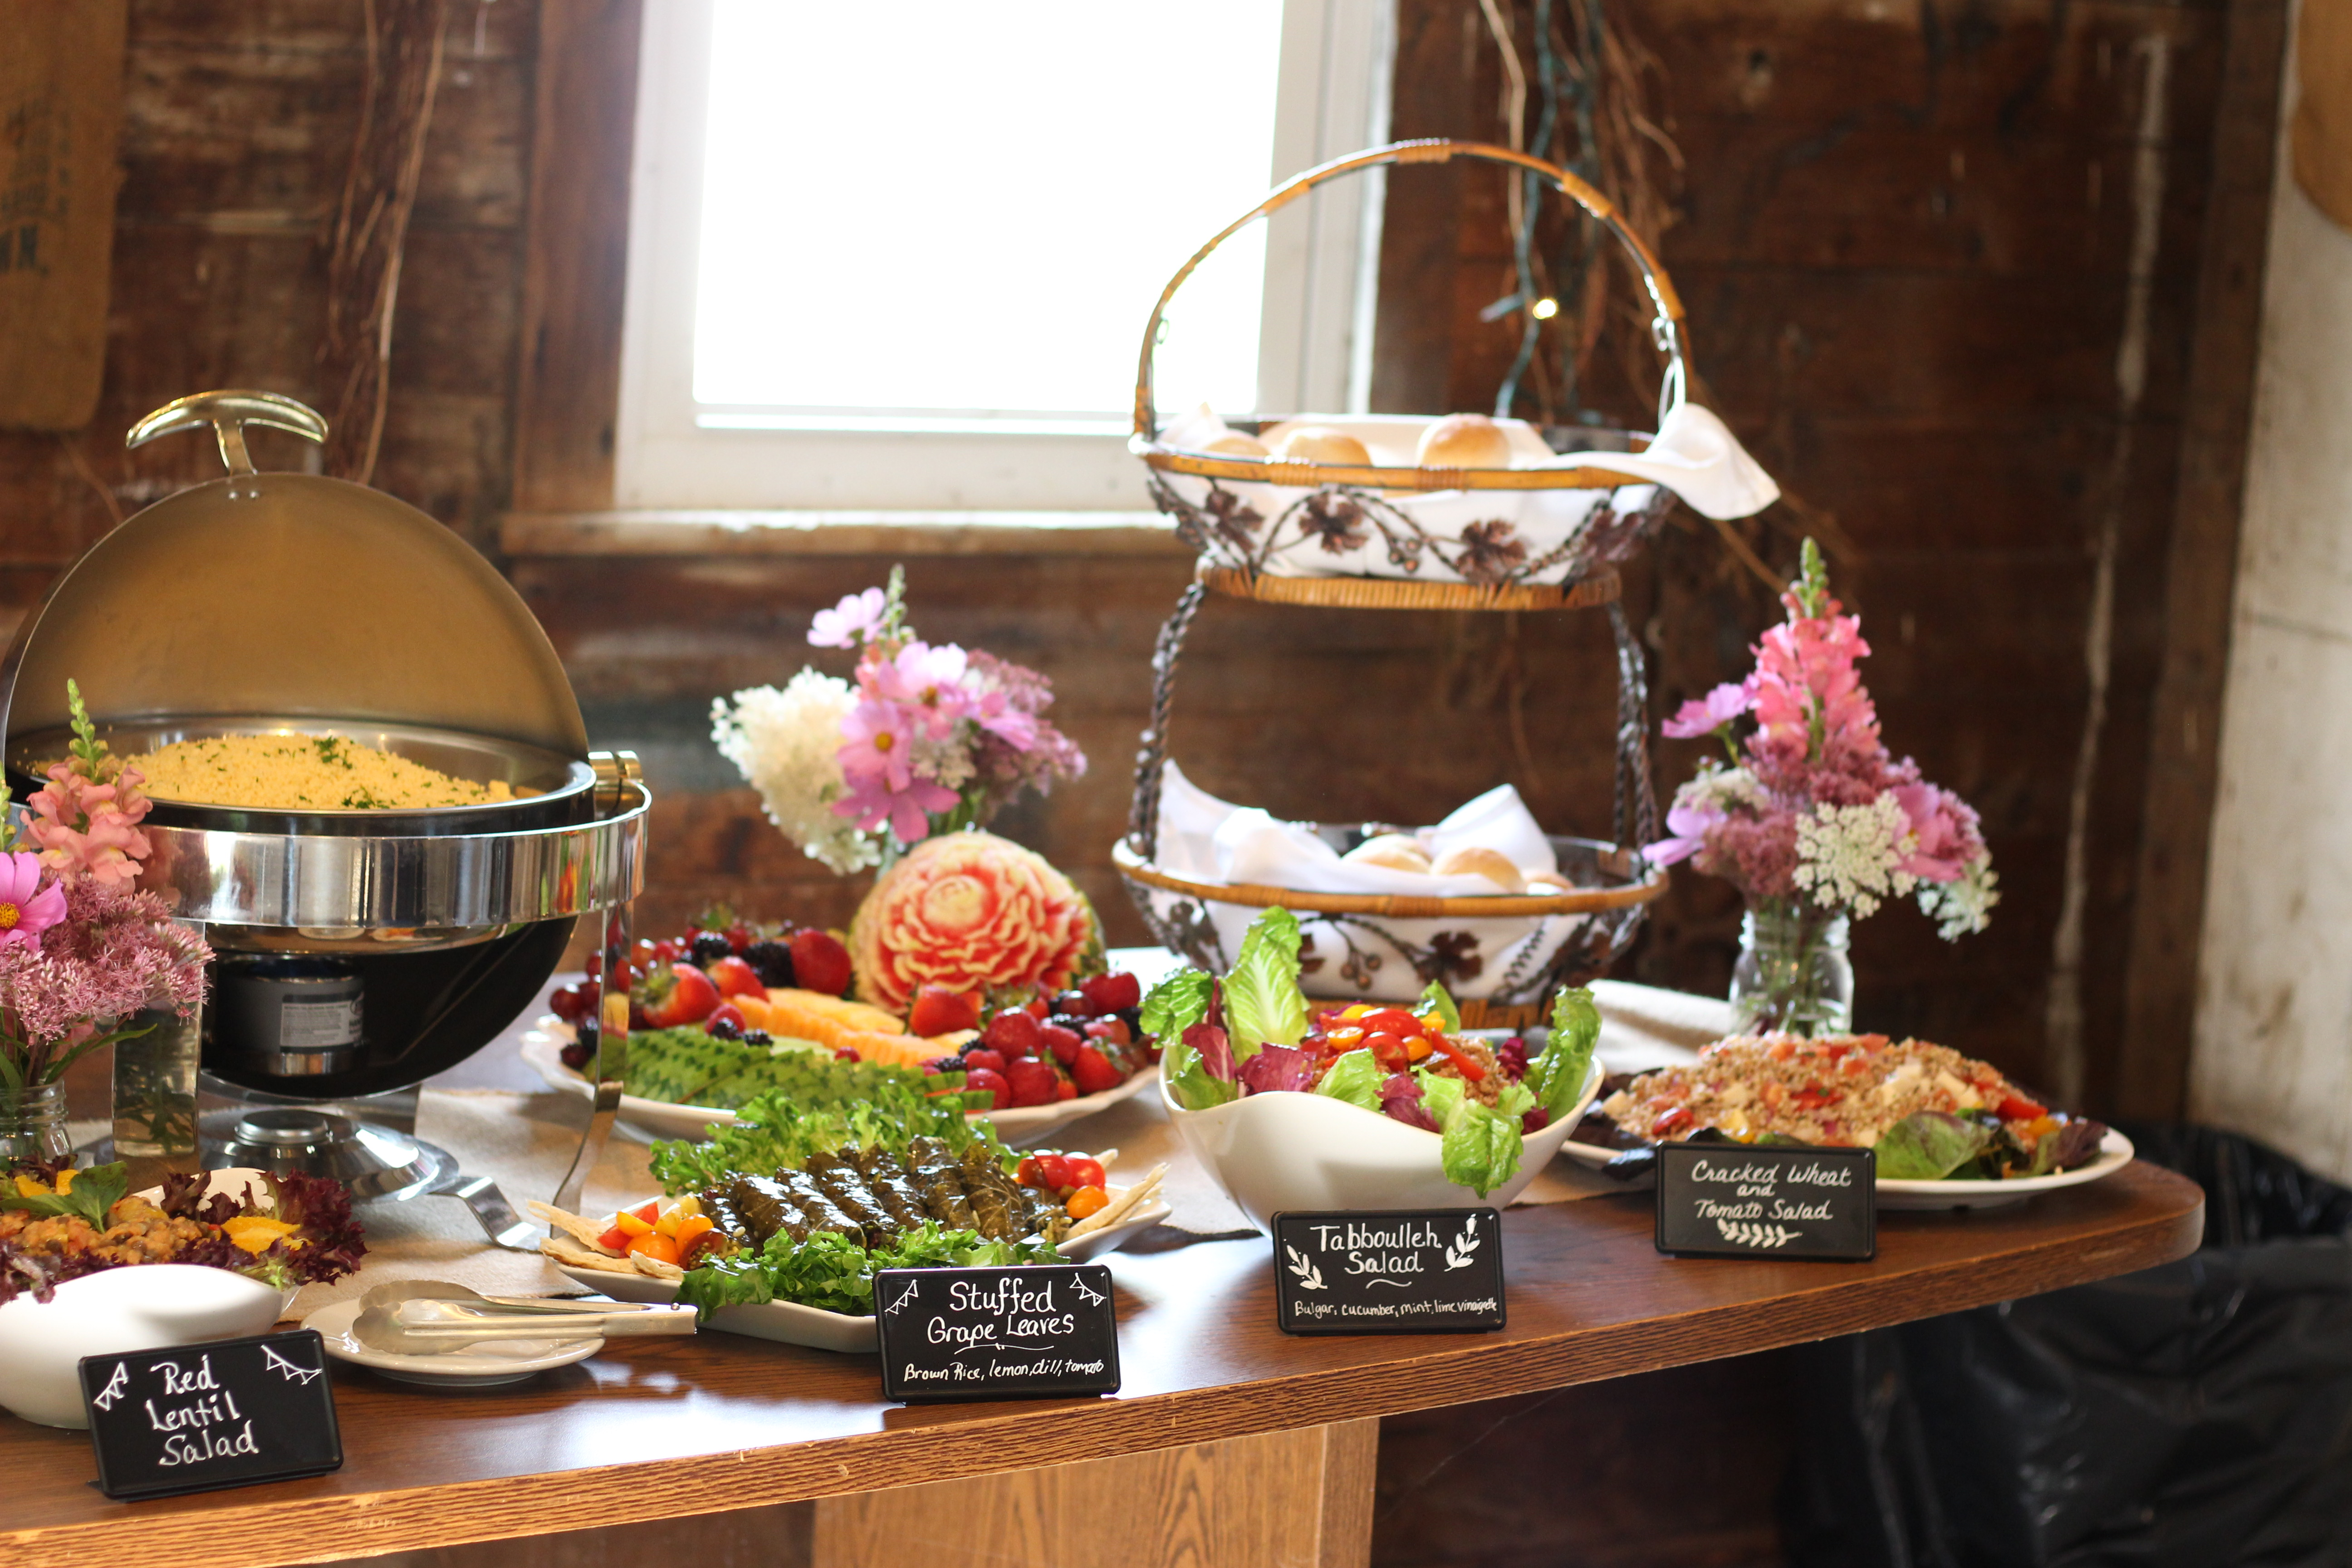 vegan wedding catering dinner buffet display